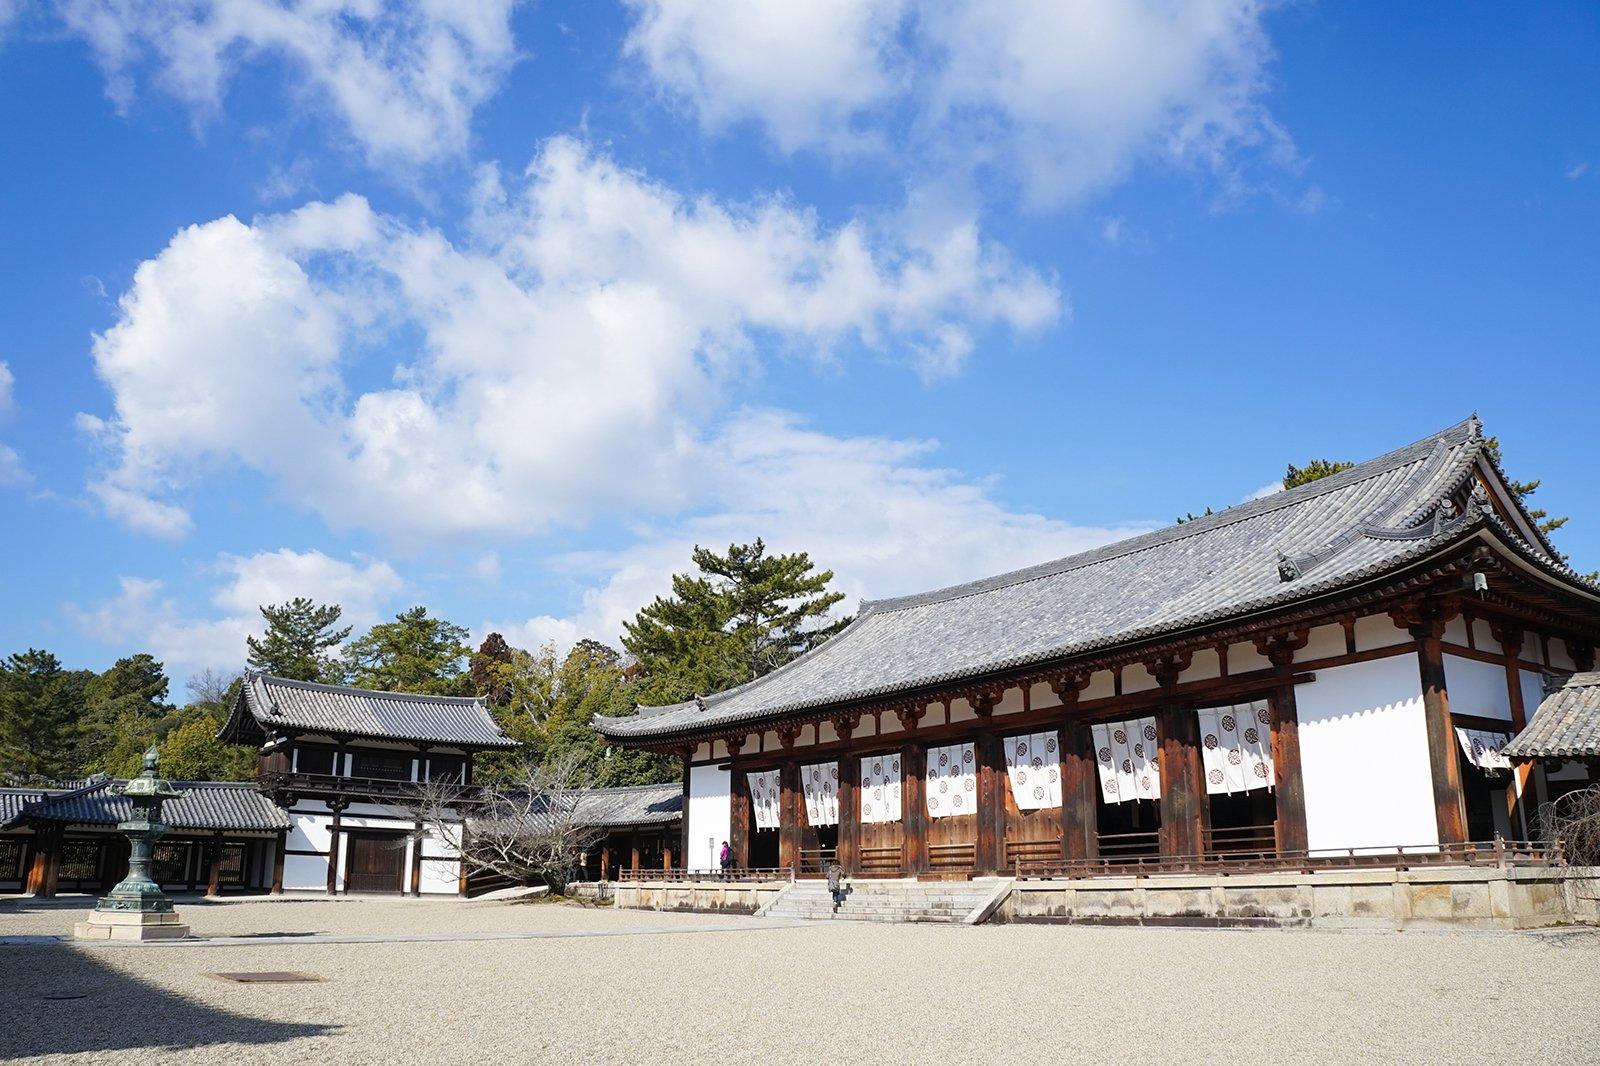 Horyuji Temple Ikaruga Dera Temple Unesco World Heritage Site Near Nara